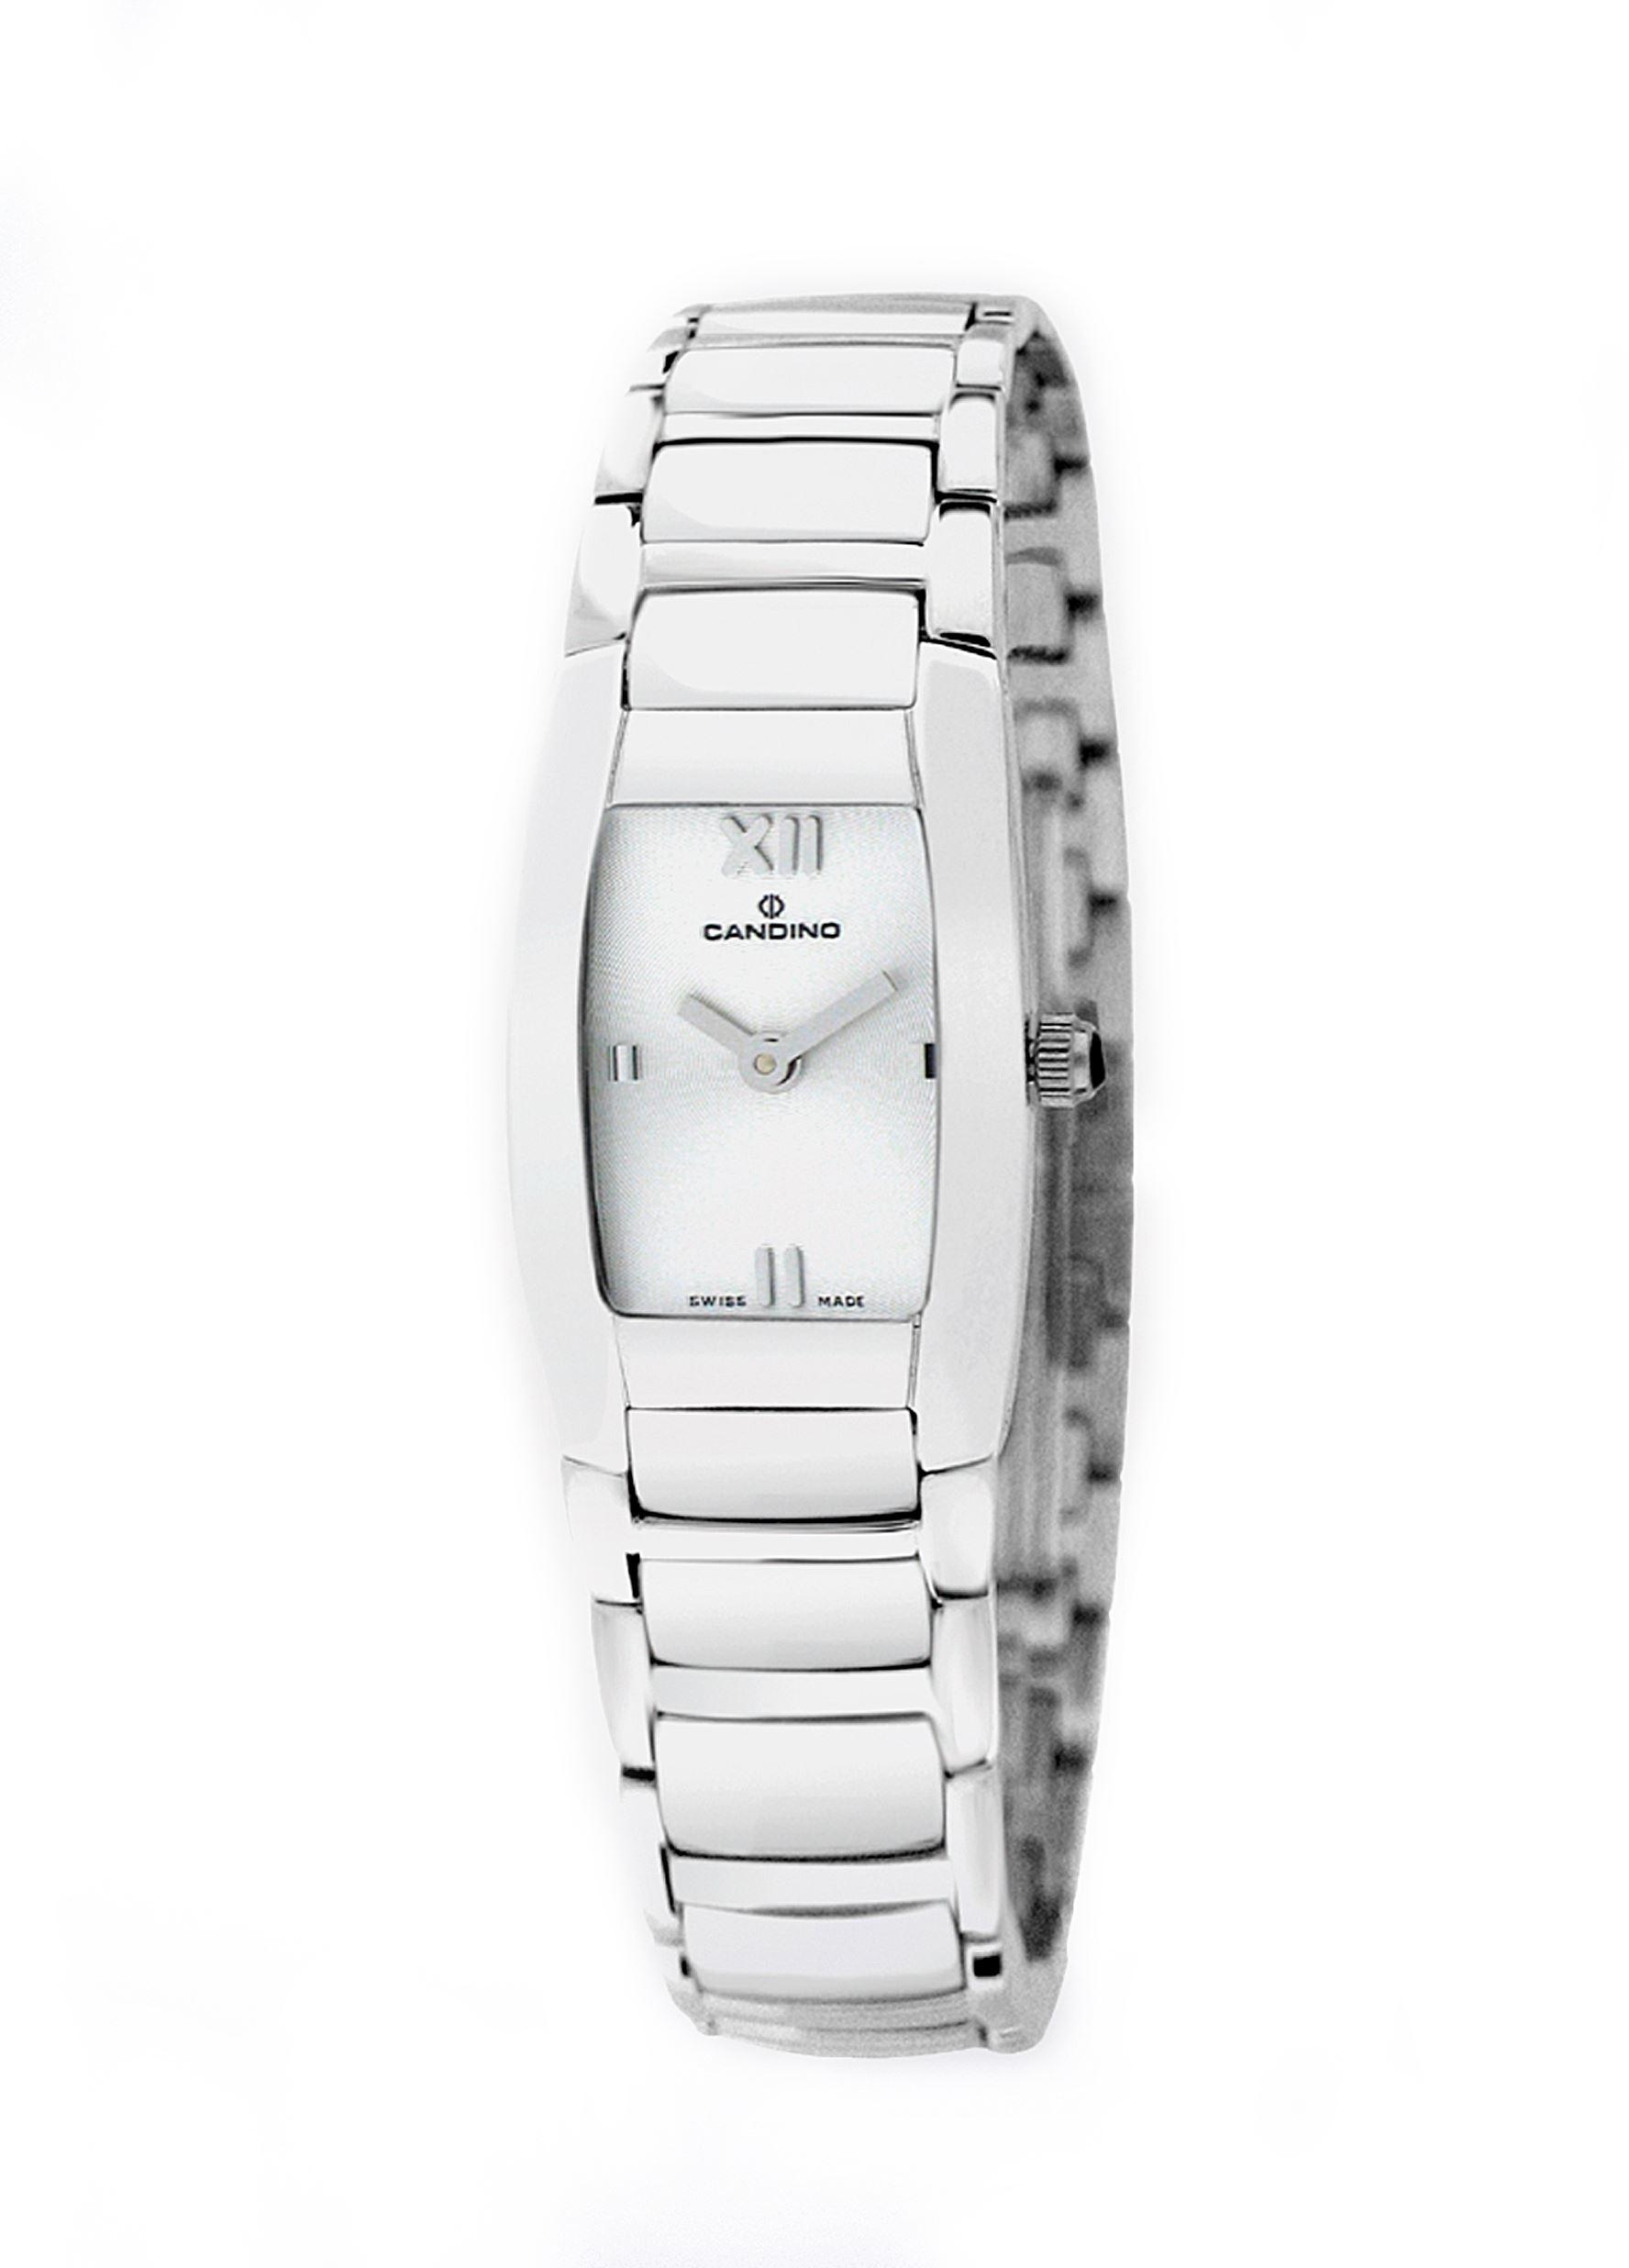 Jaguar & More - Γυναικείο Ρολόι CANDINO